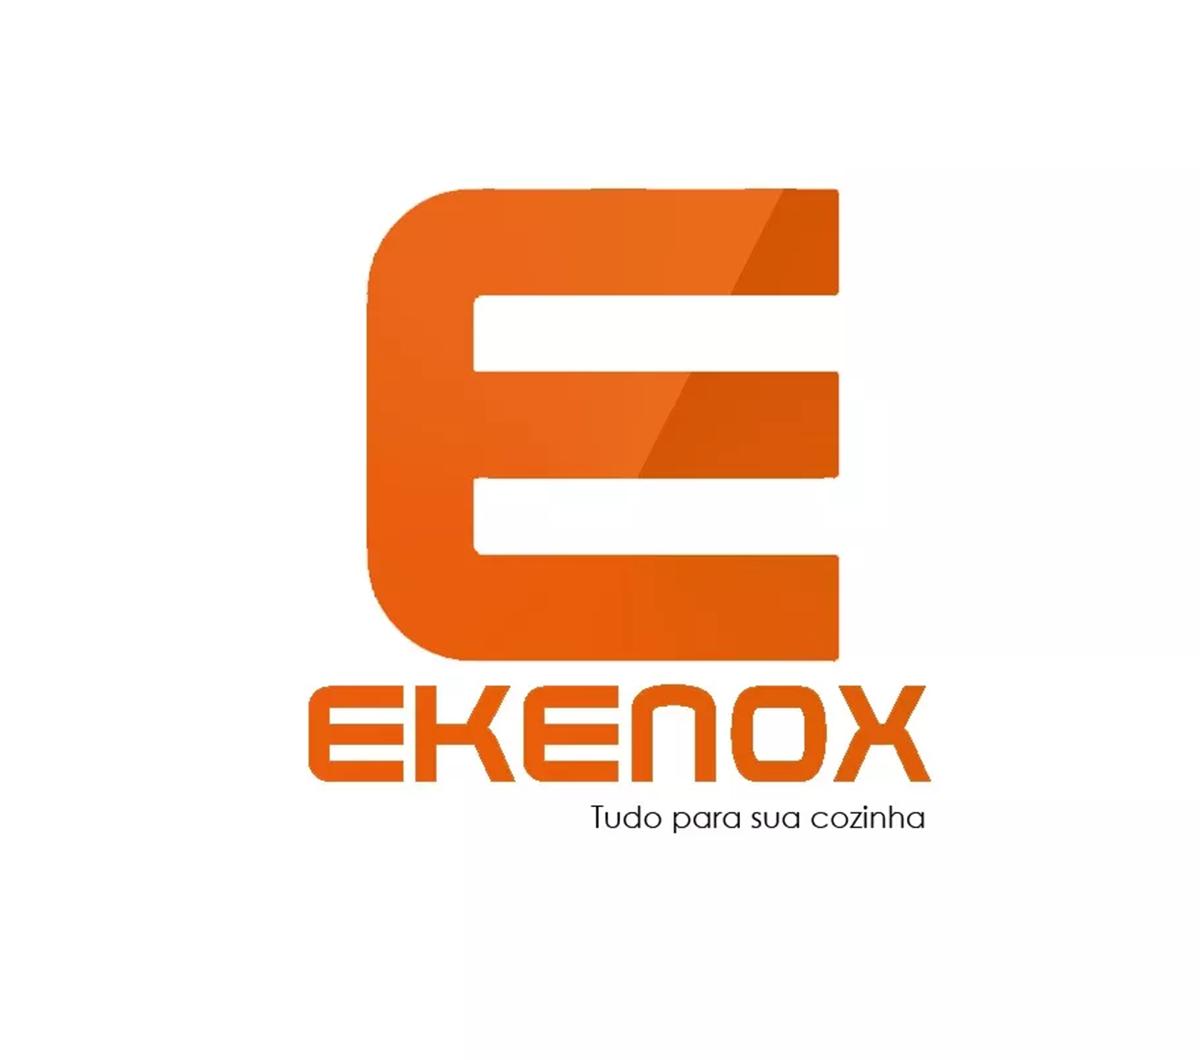 Conjunto de Bicos de Confeitar Inox 22 Peças  - EKENOX- Equipamentos Industriais